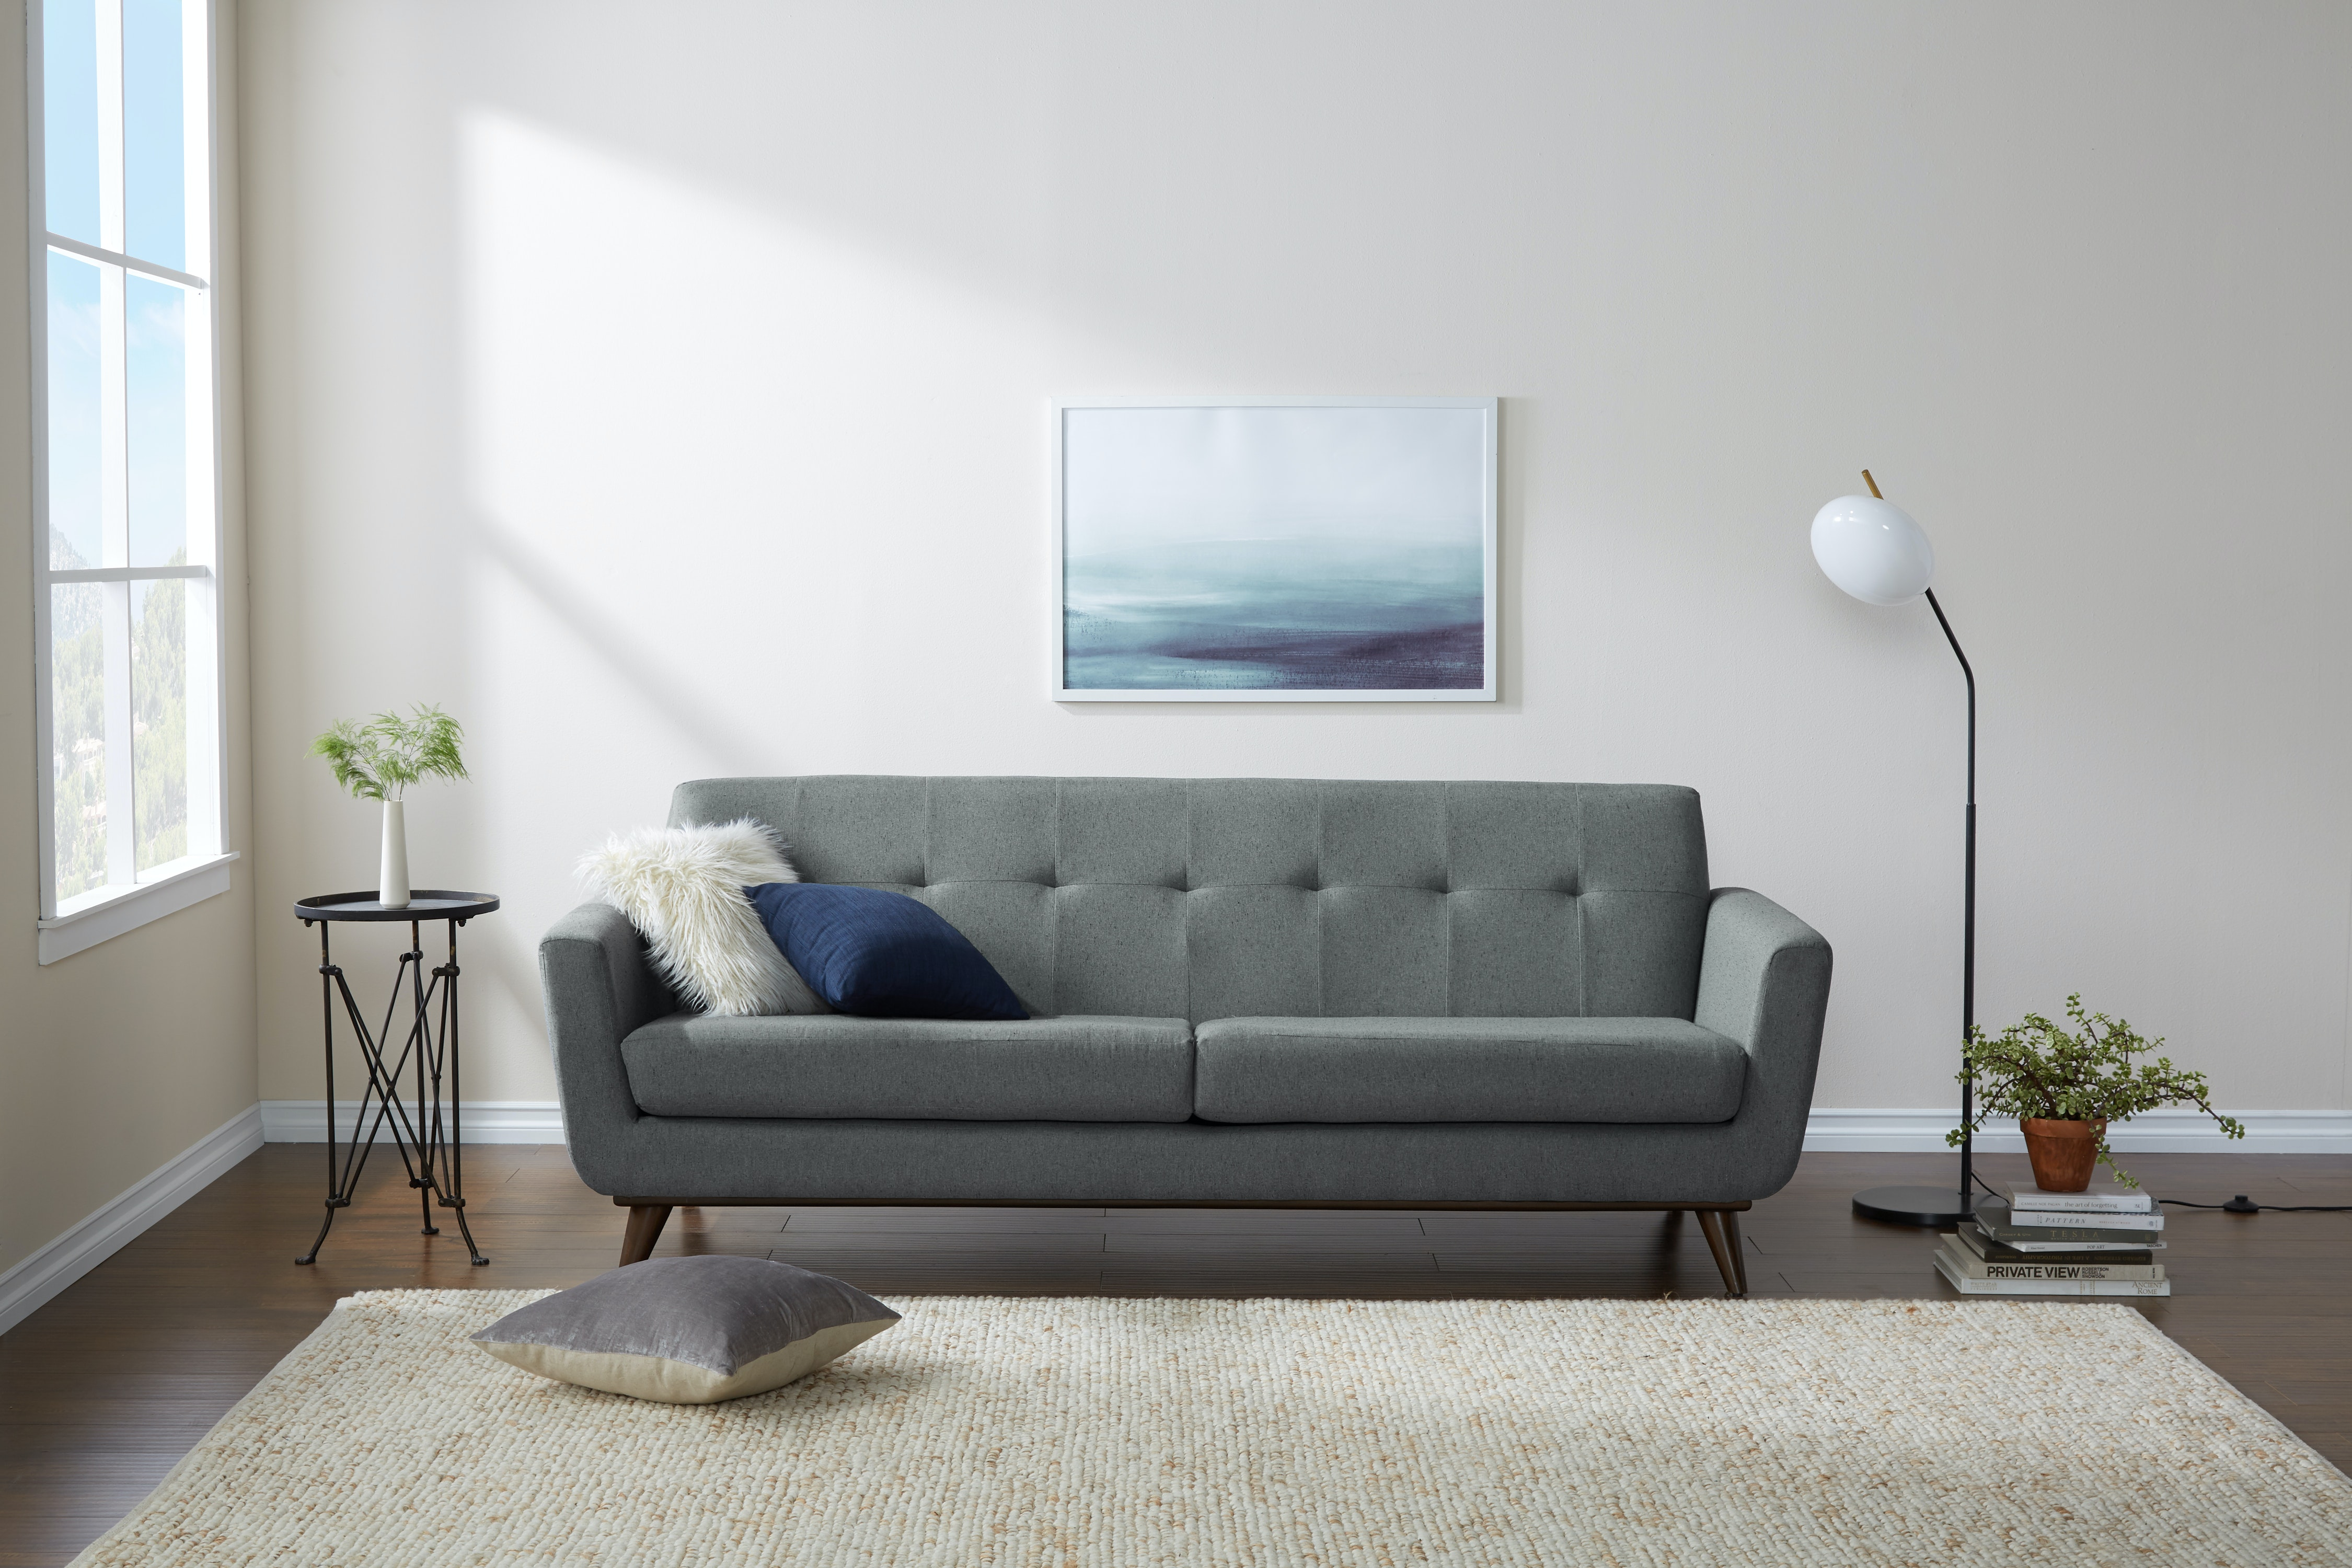 wishing chair photo frame wheelchair shower hughes sofa joybird main gallery image